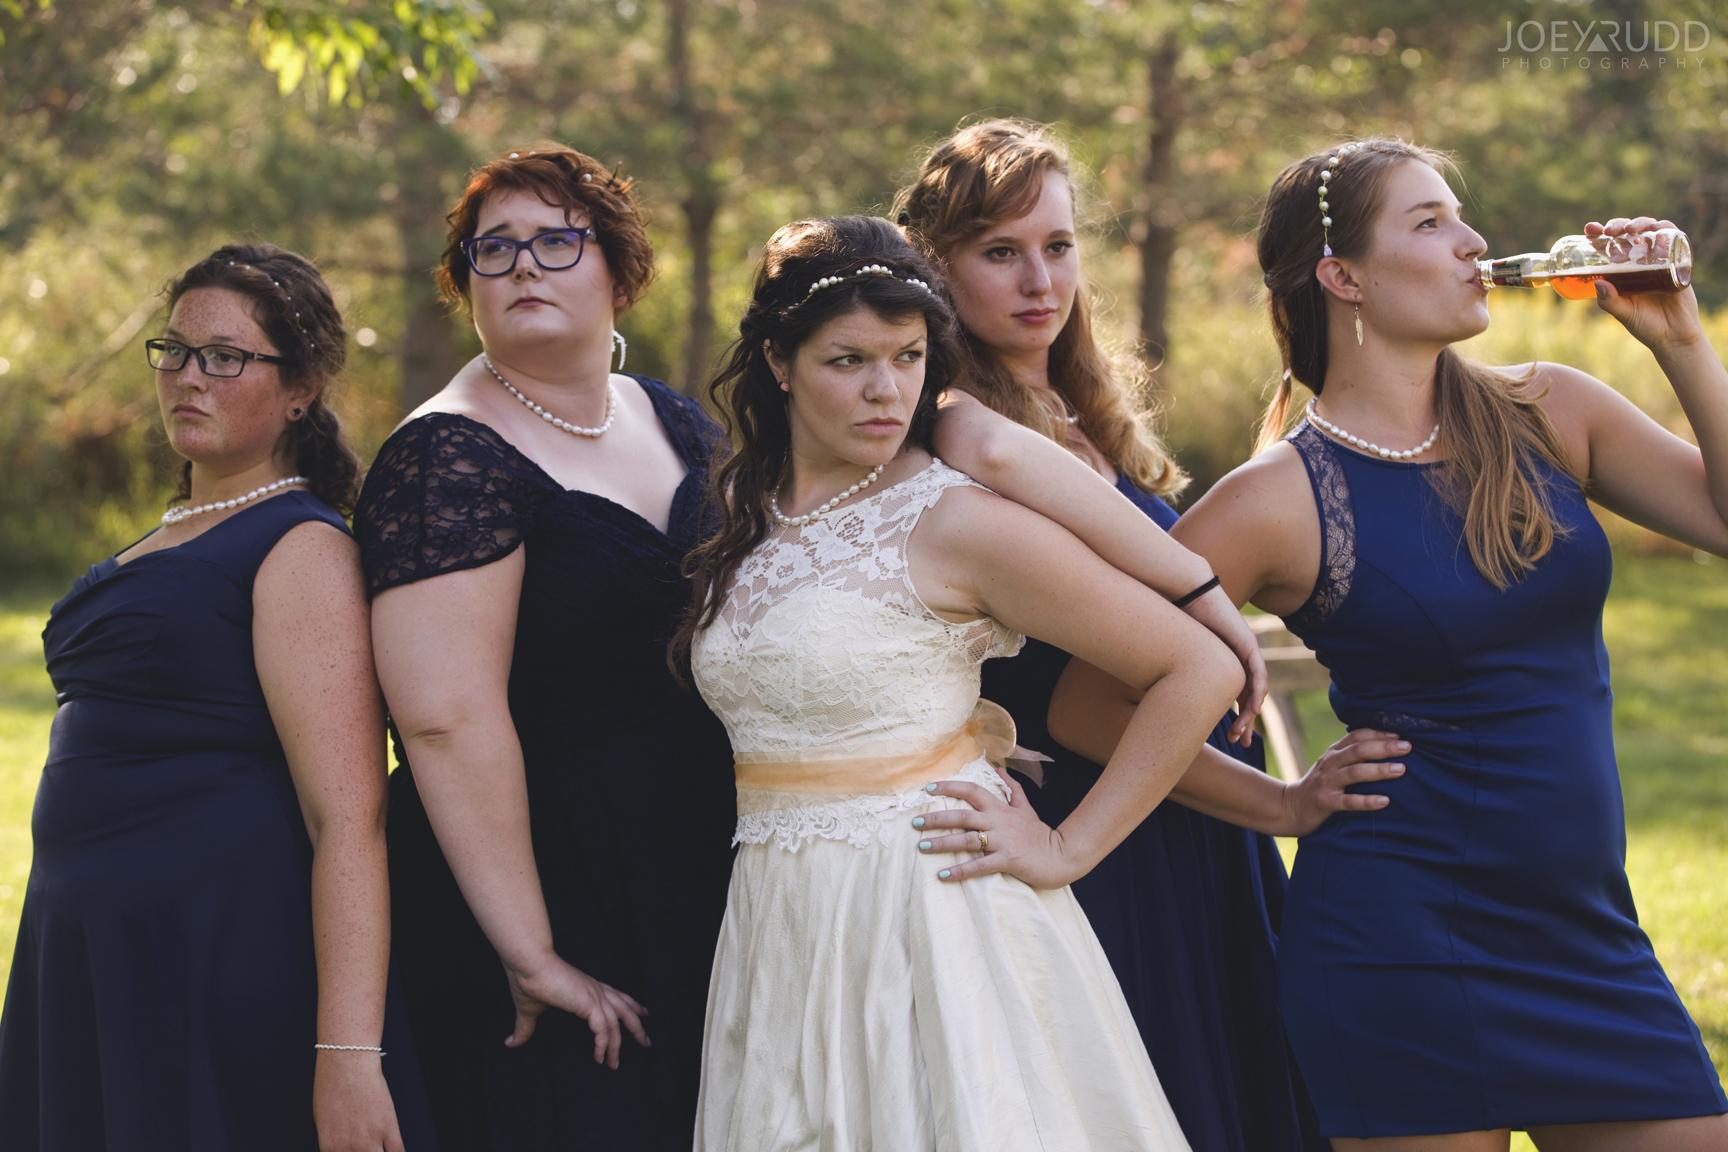 Backyard Kingston Wedding by Ottawa Wedding Photographer Joey Rudd Photography Creative Bridesmaid Pose